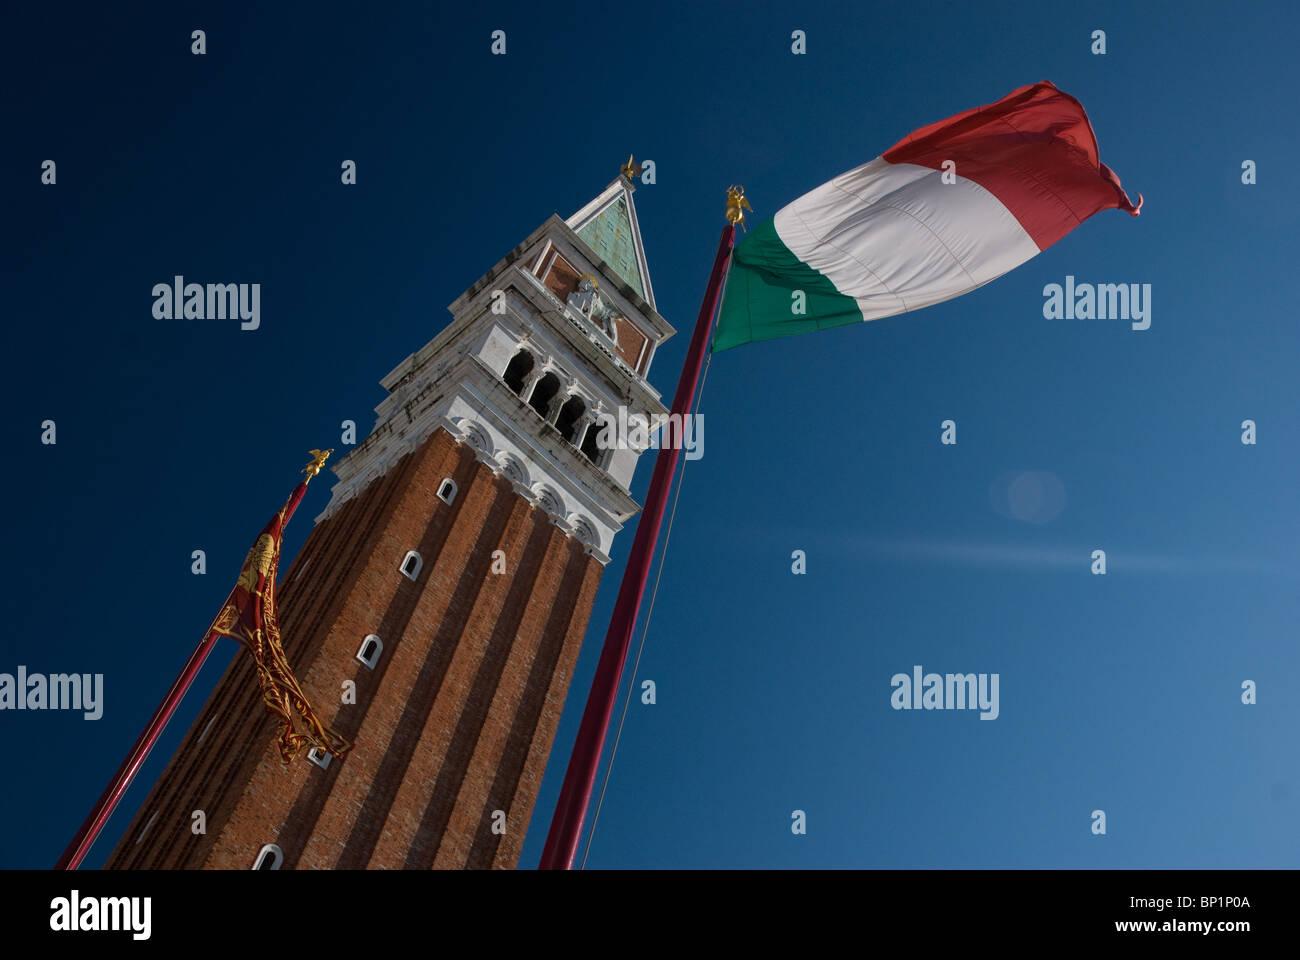 Italian flag and Campanile, St Mark's Square, Venice, Italy - Stock Image